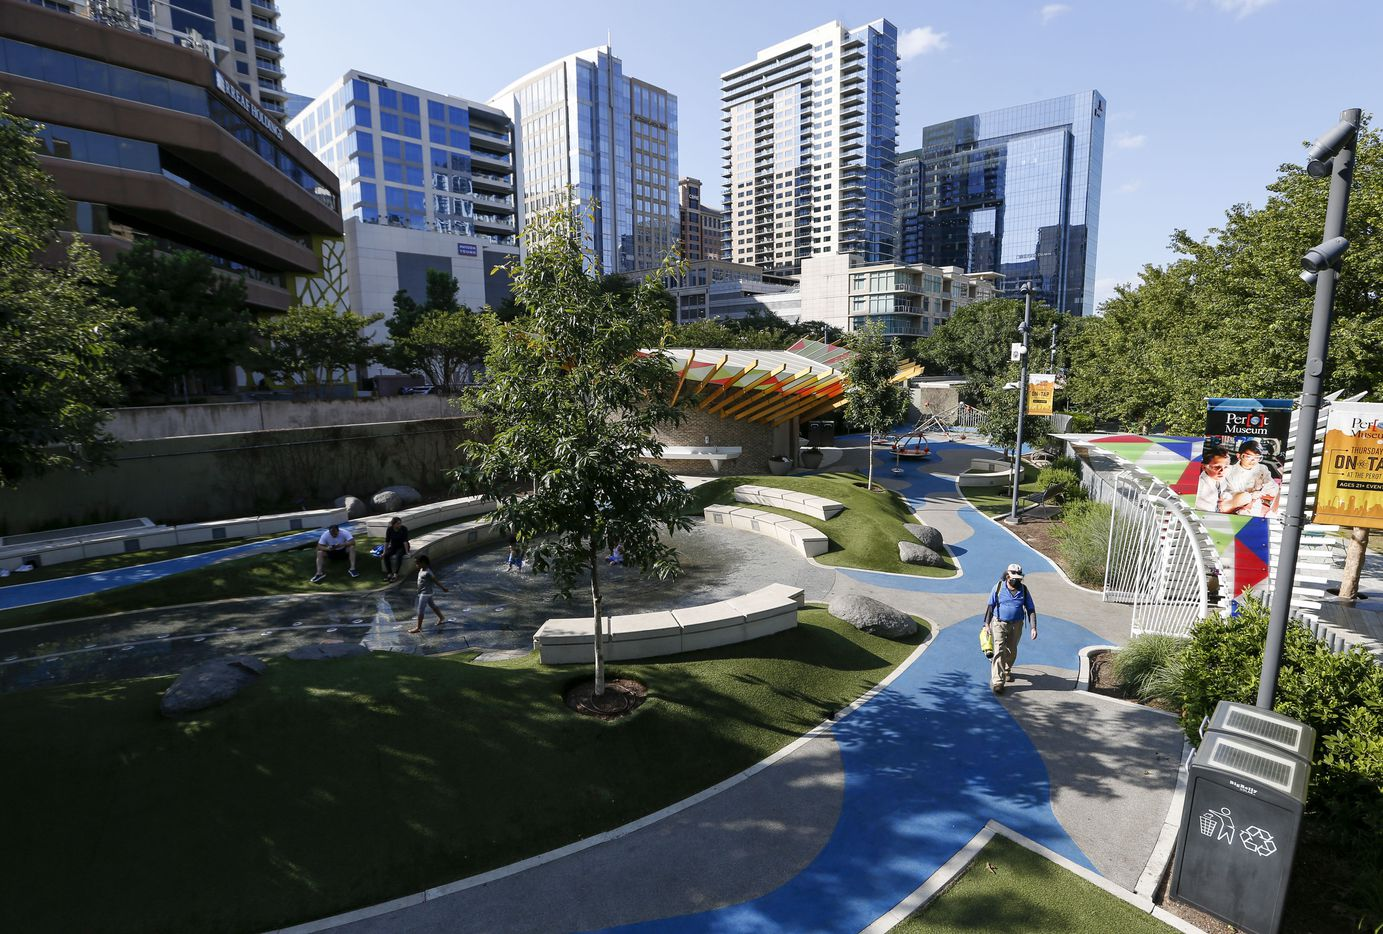 The Children's Park at Klyde Warren Park on Wednesday, June 23, 2021, in Dallas.